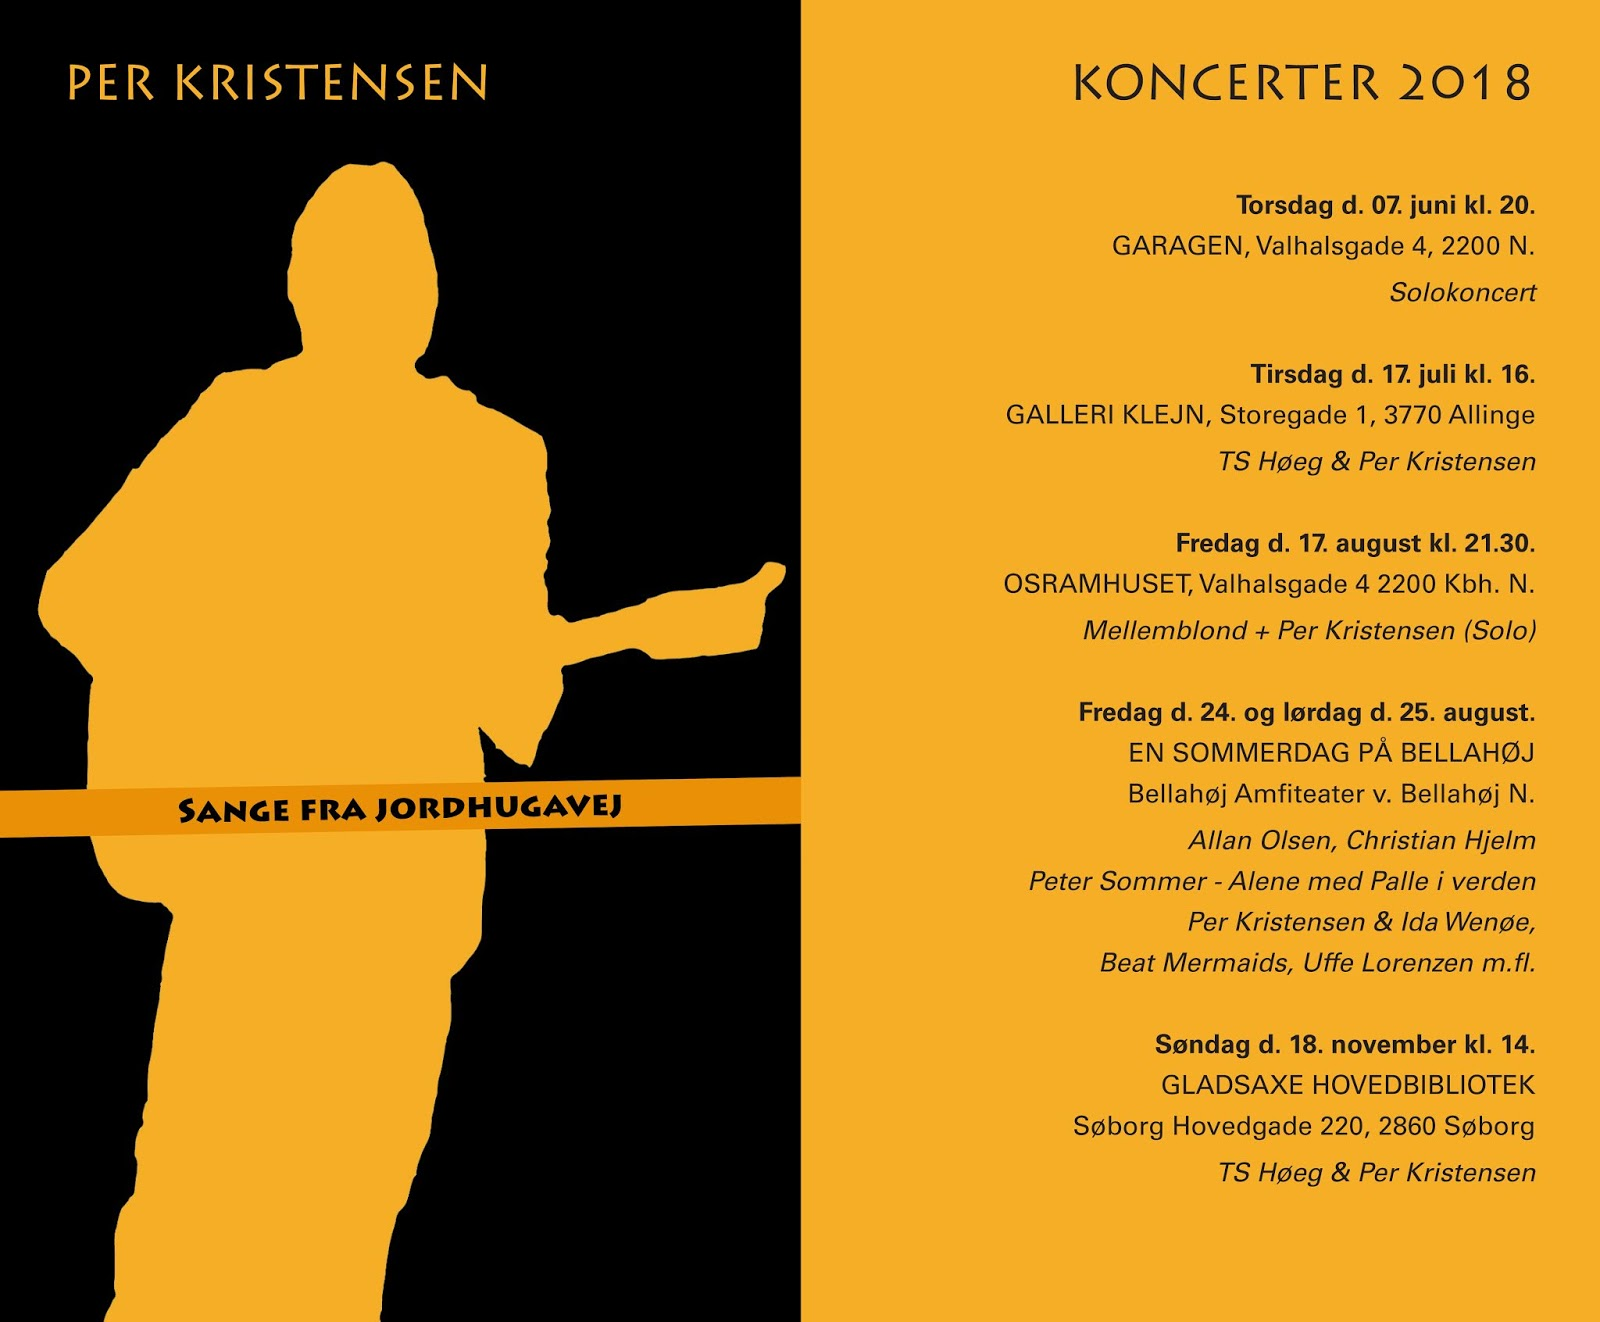 b67b55d582ac Per Kristensen Koncerter 2018